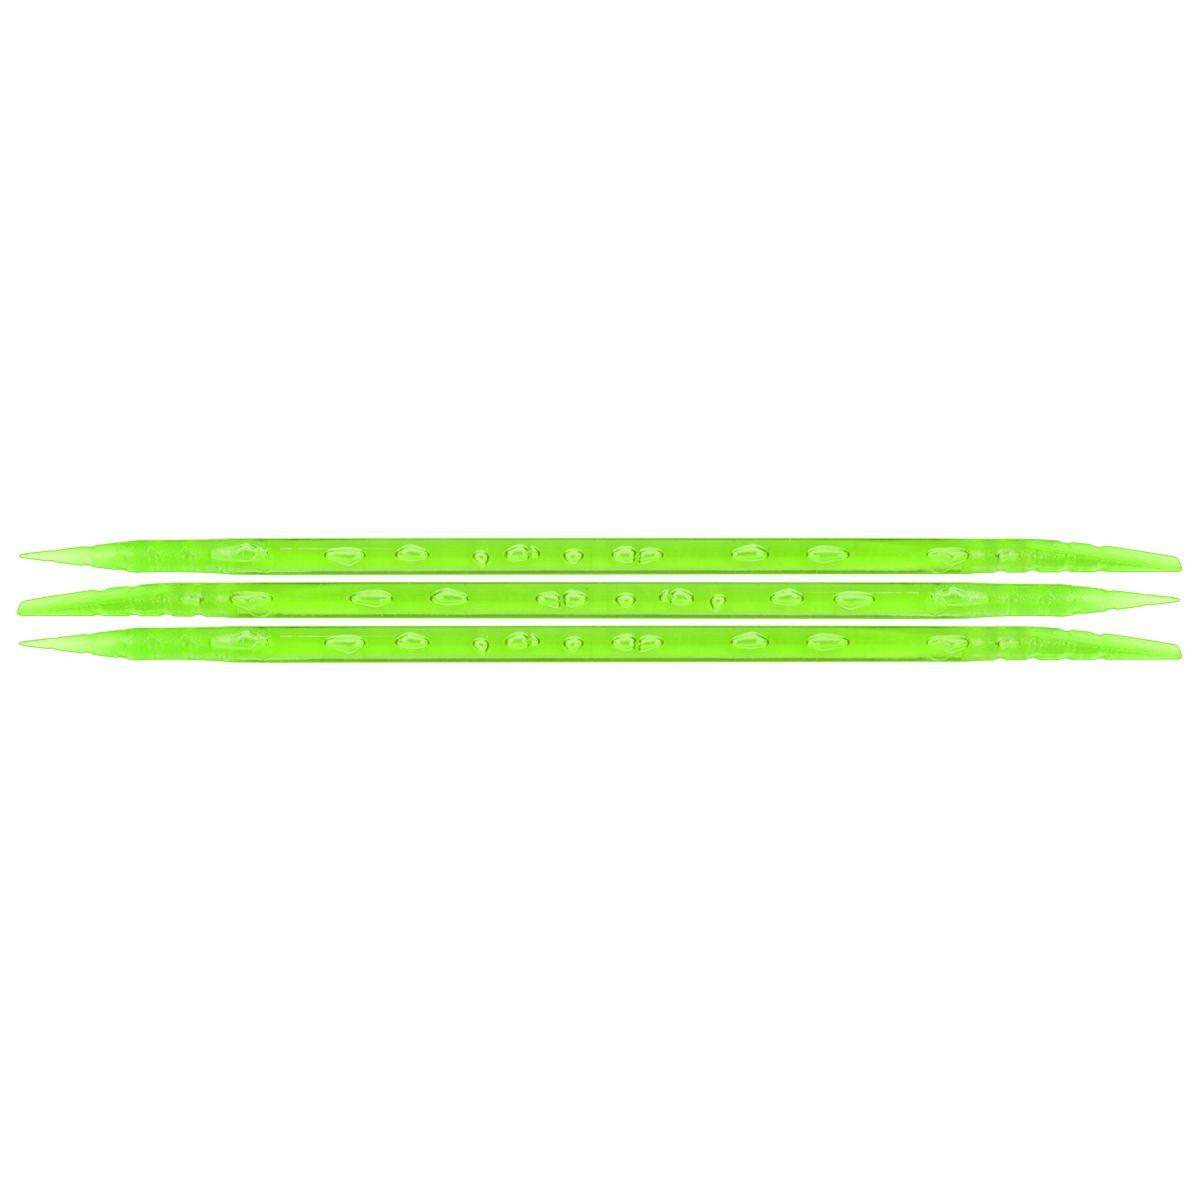 Palito Pl�stico Verde Para Manicure Descart�vel 100 Unidades